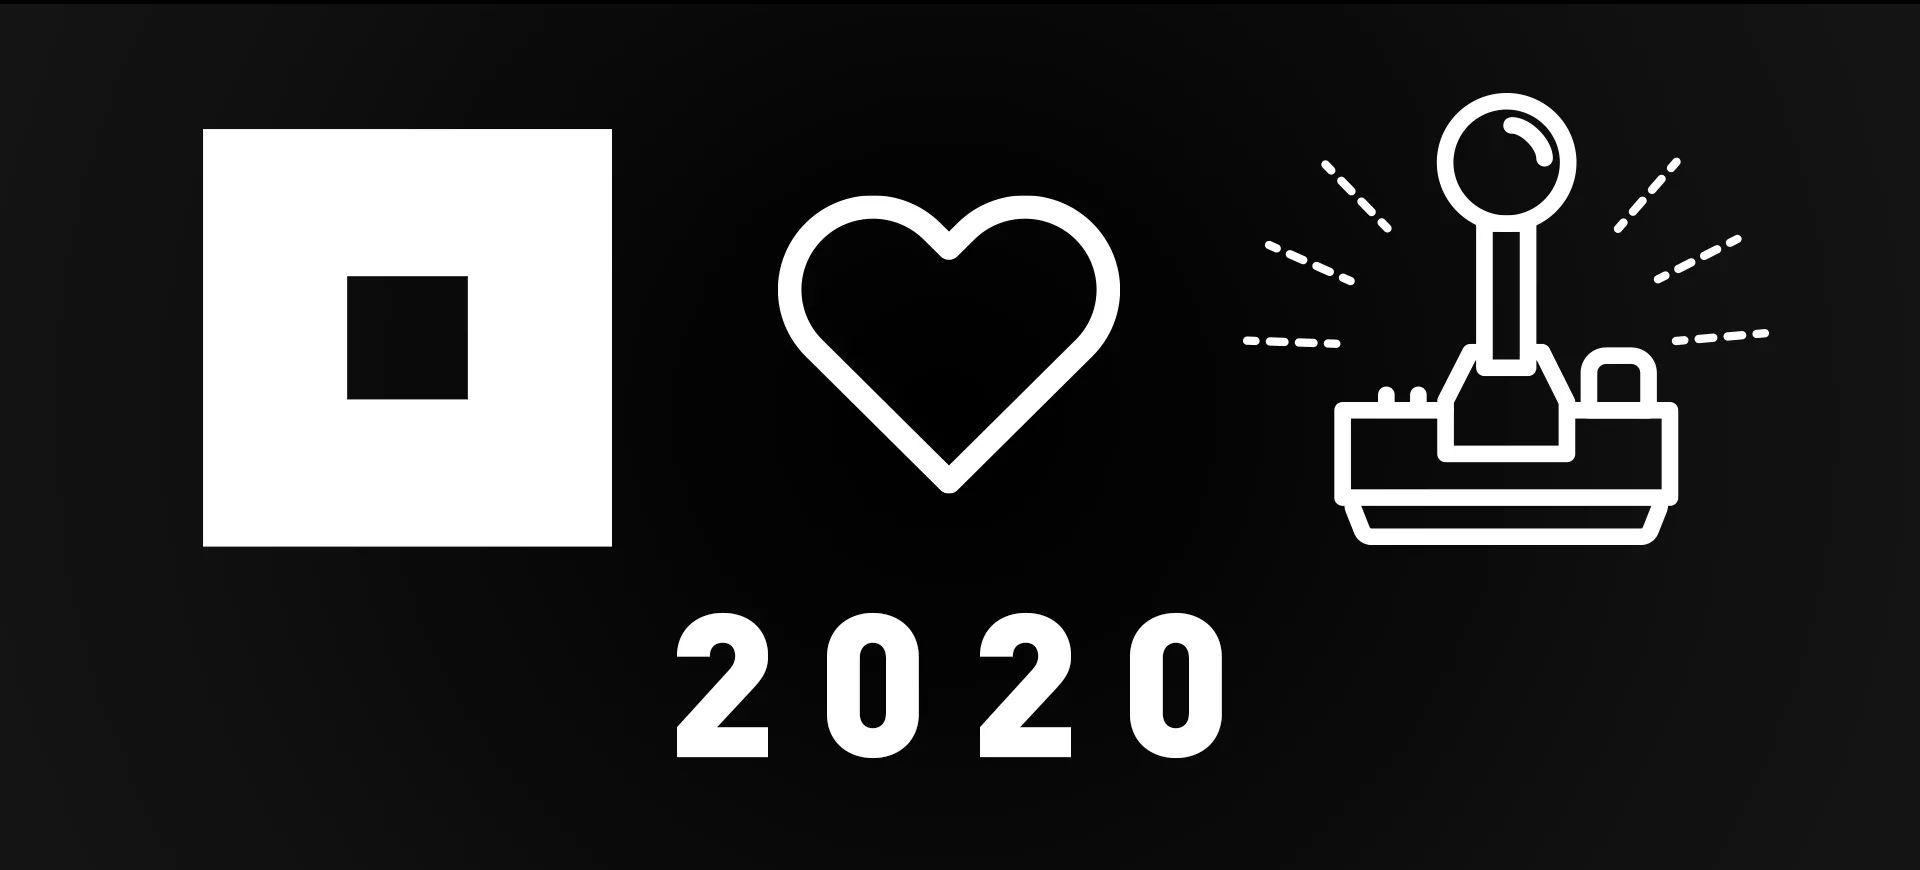 TopGames2020-BNET.jpg